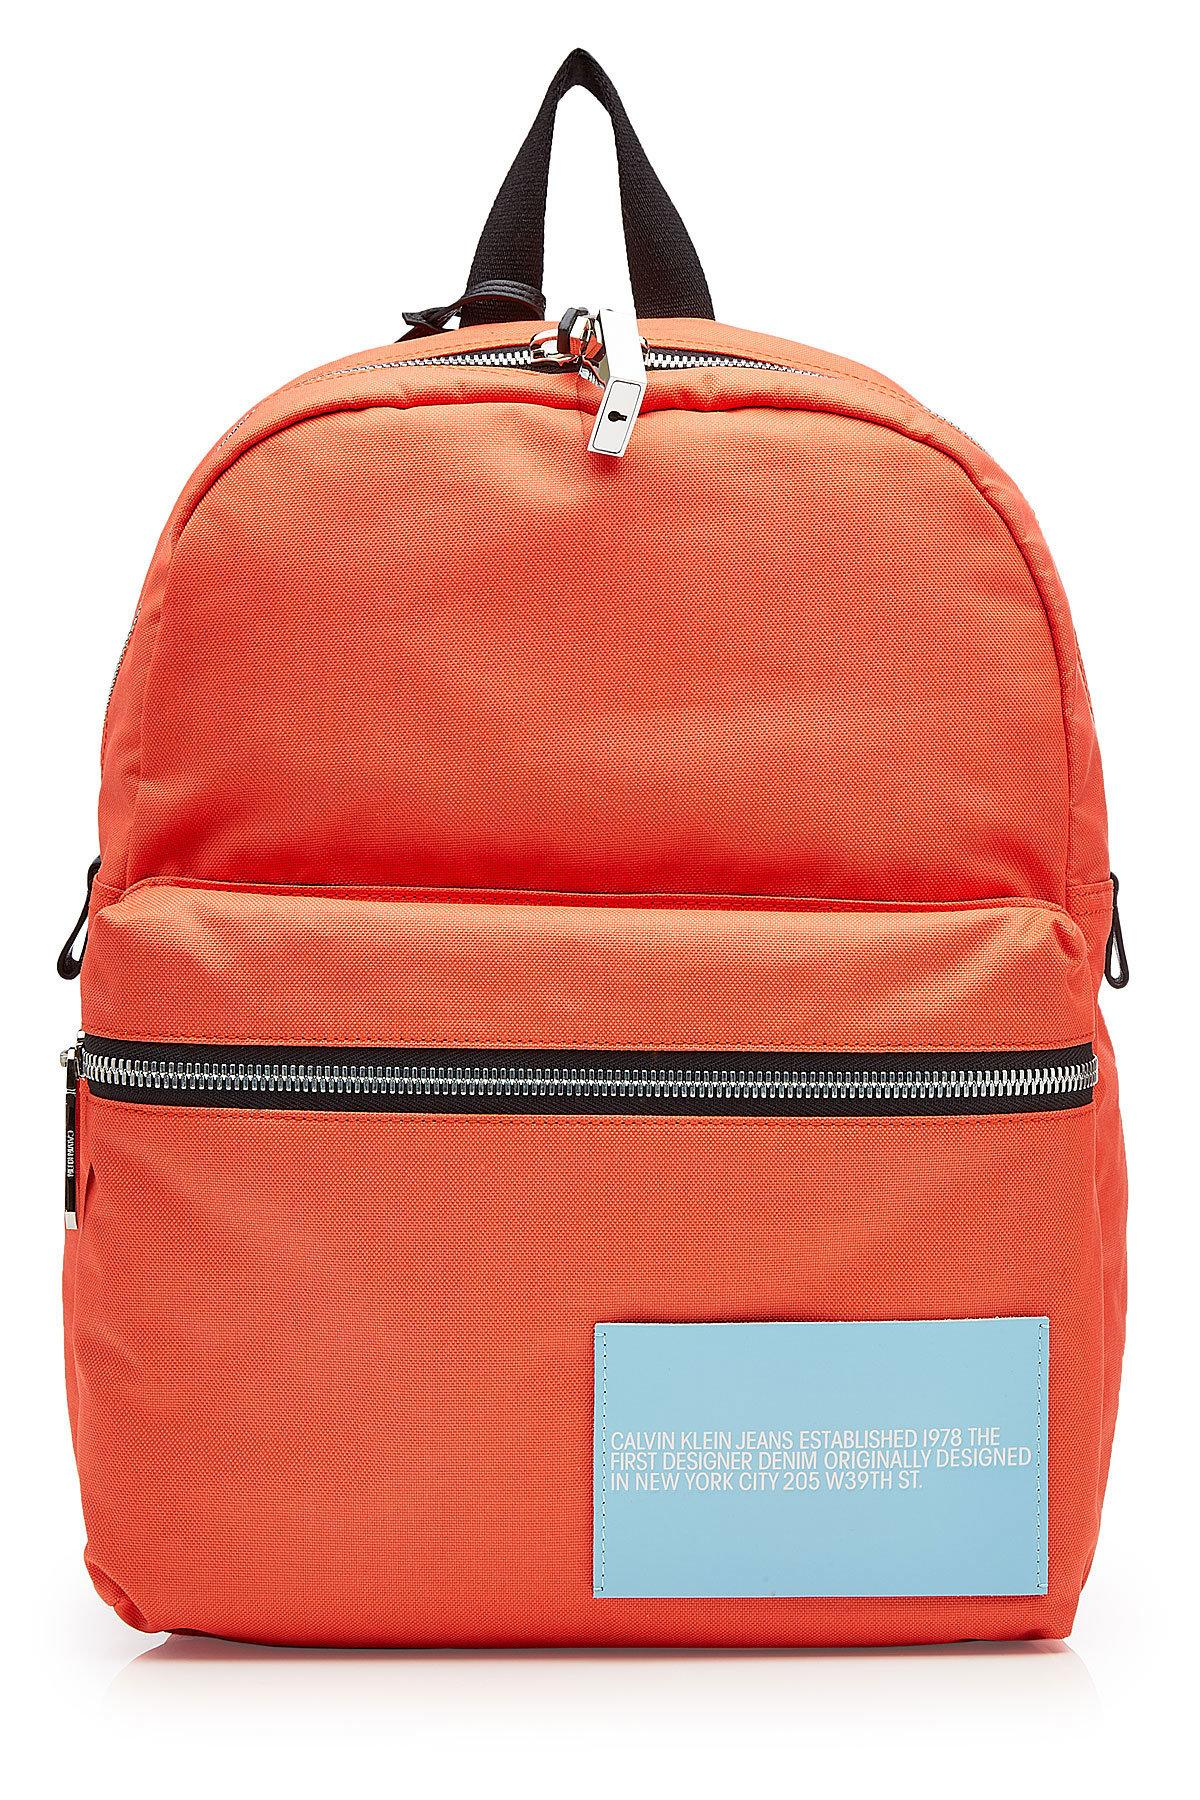 Calvin Klein 205W39Nyc Fabric Backpack In Orange